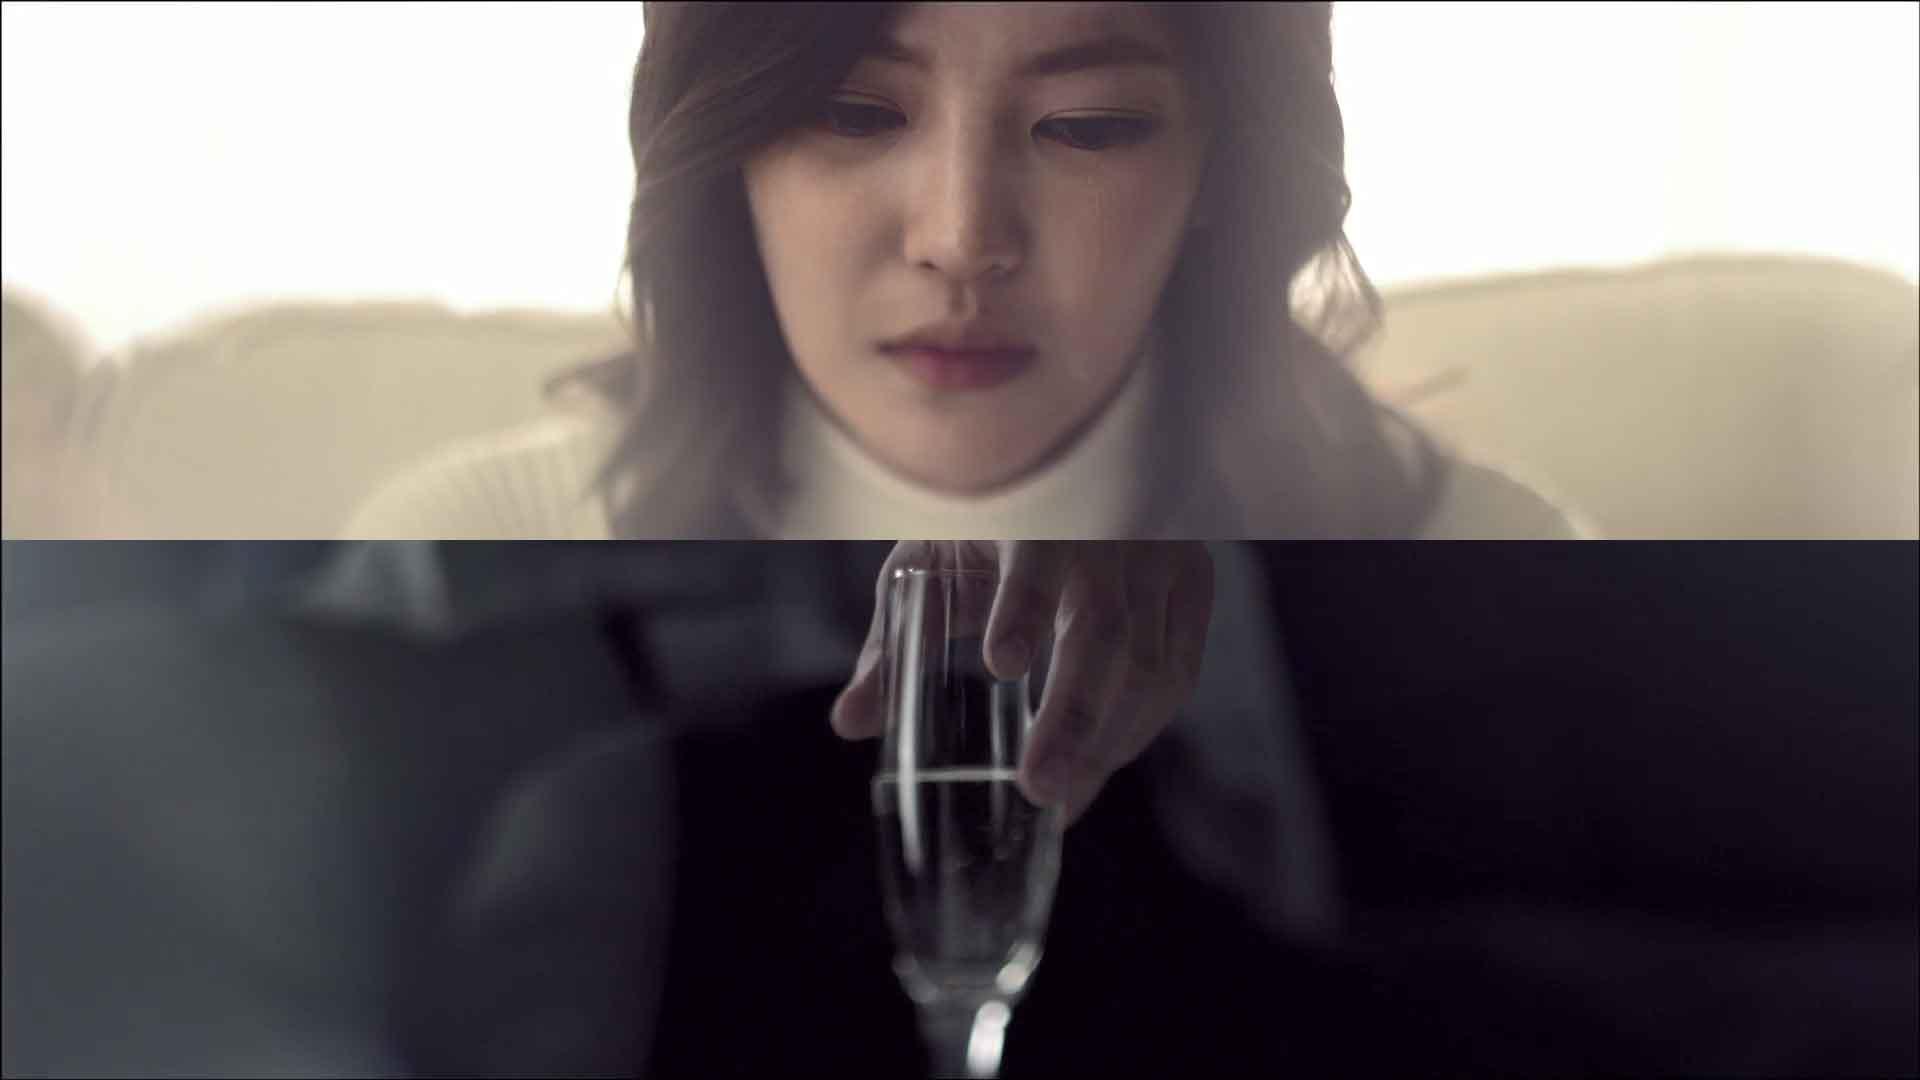 [1080P] LeeSSang feat. Eugene - Tears  眼泪(FULL HD - 311M)